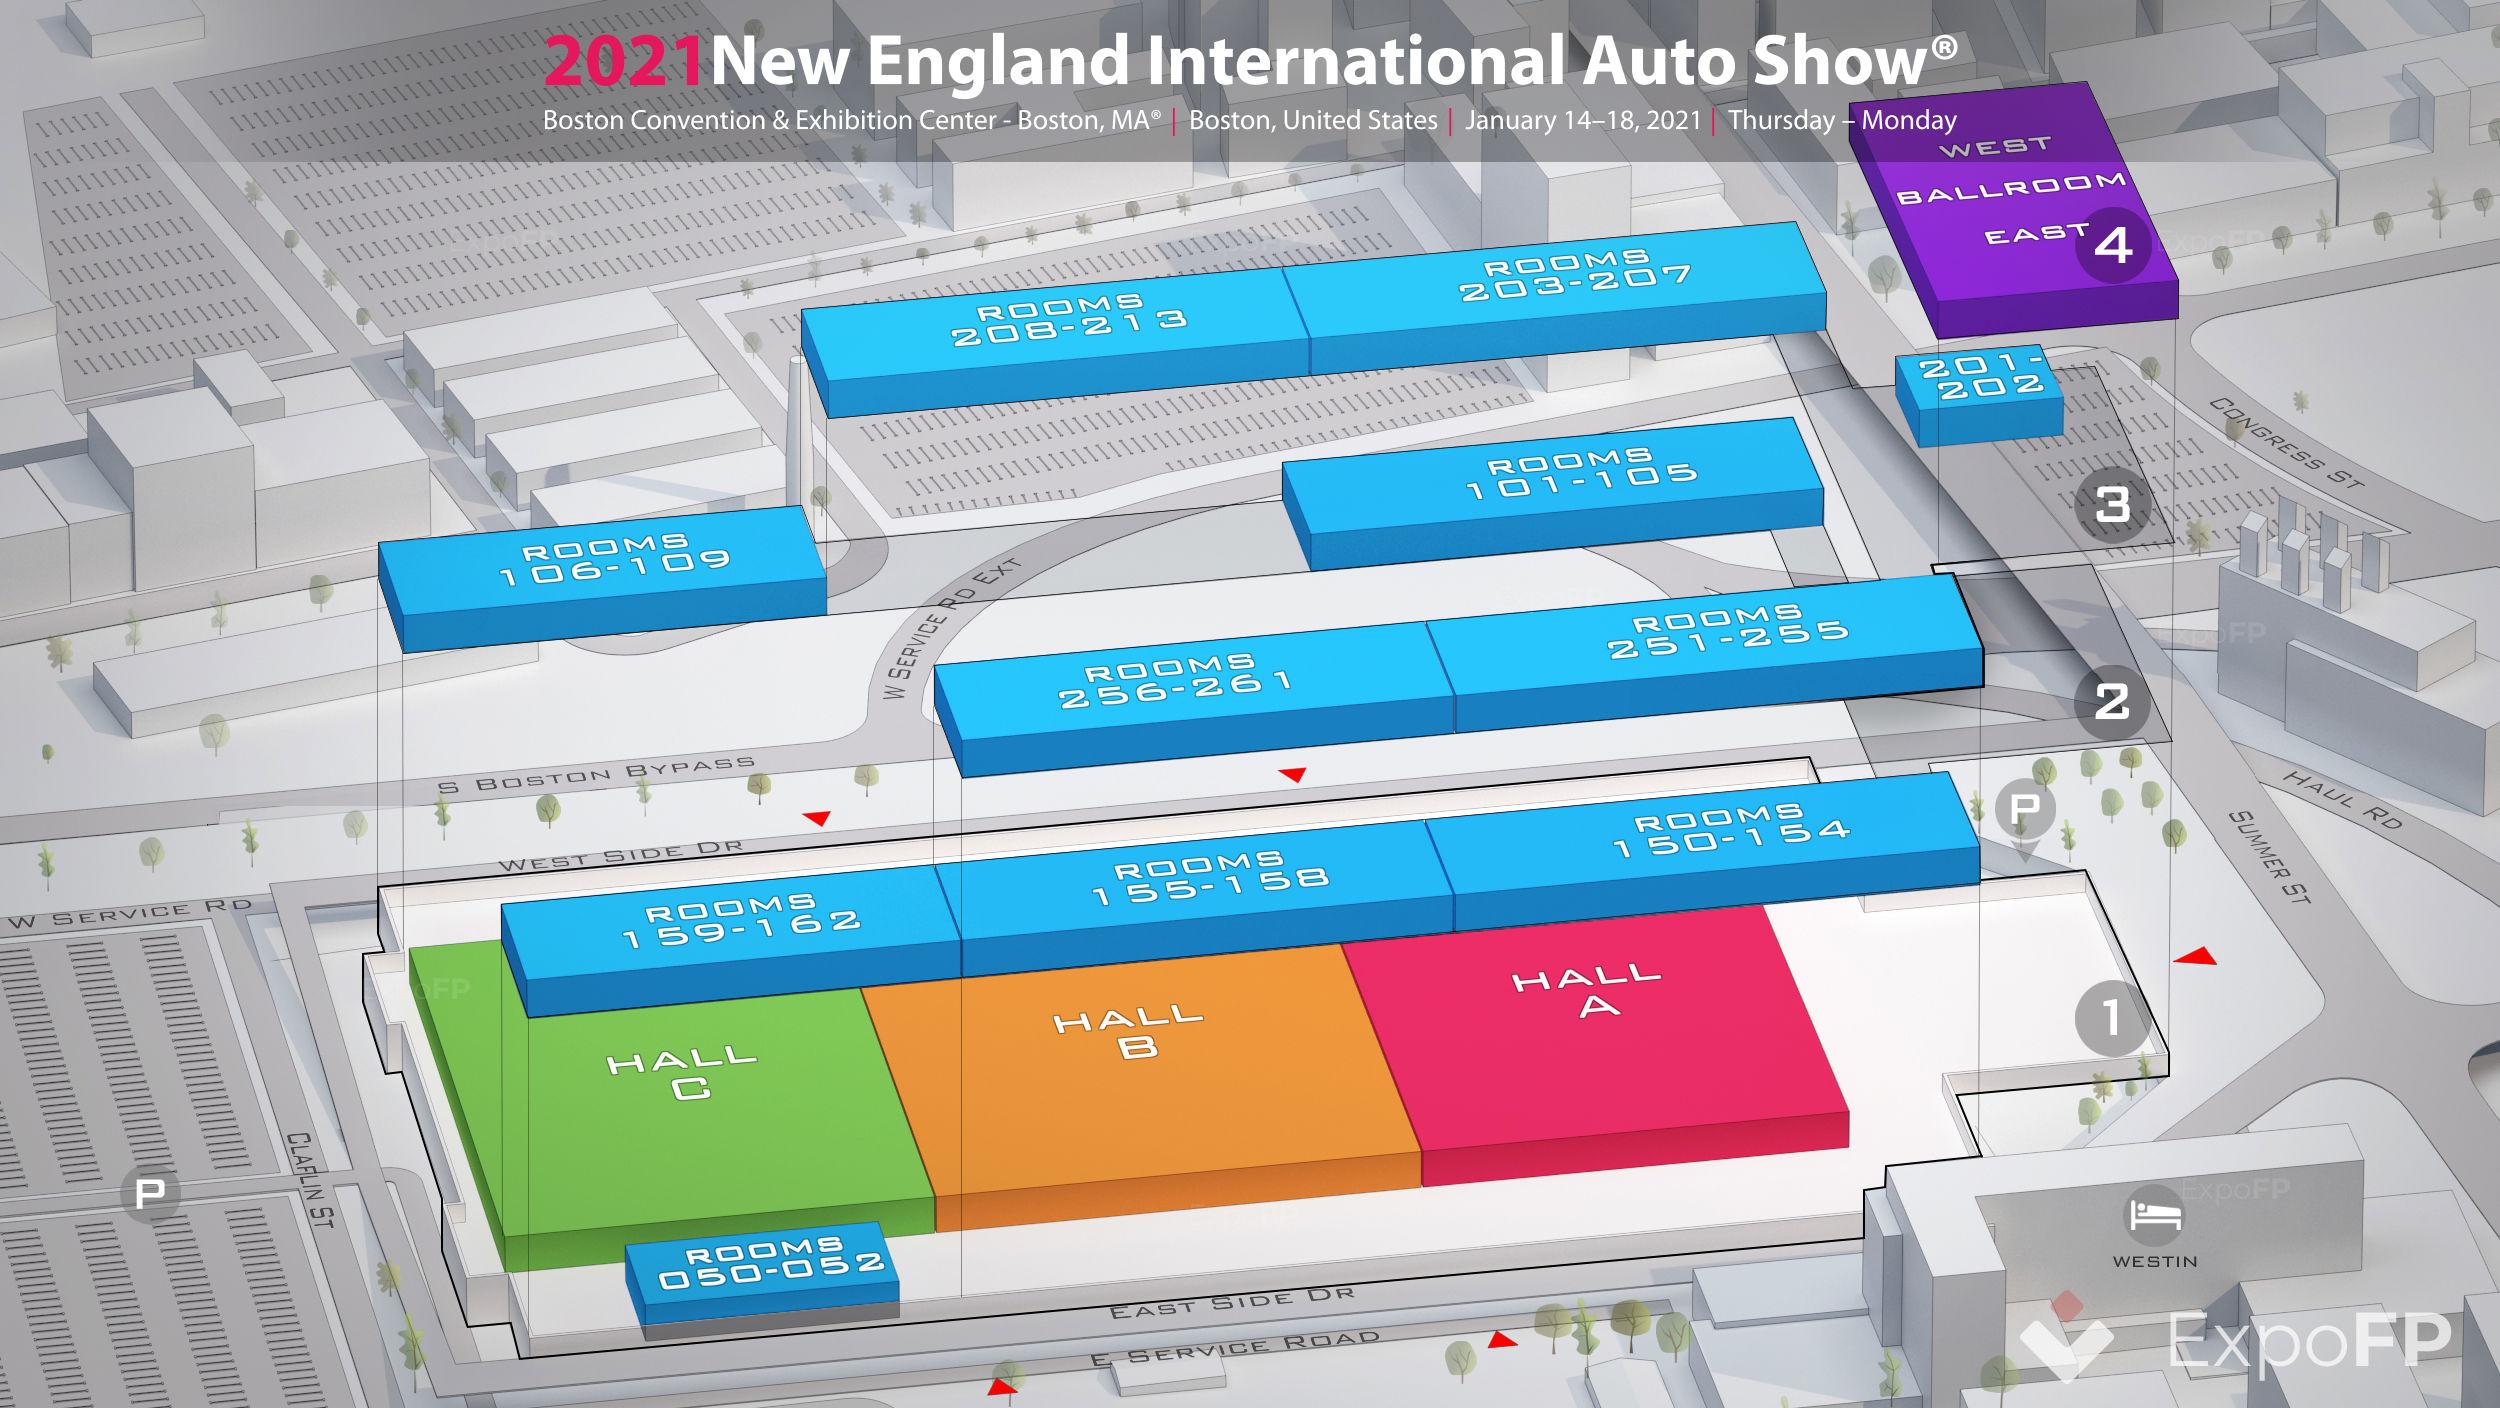 New England International Auto Show 2021 In Boston Convention Exhibition Center Boston Ma